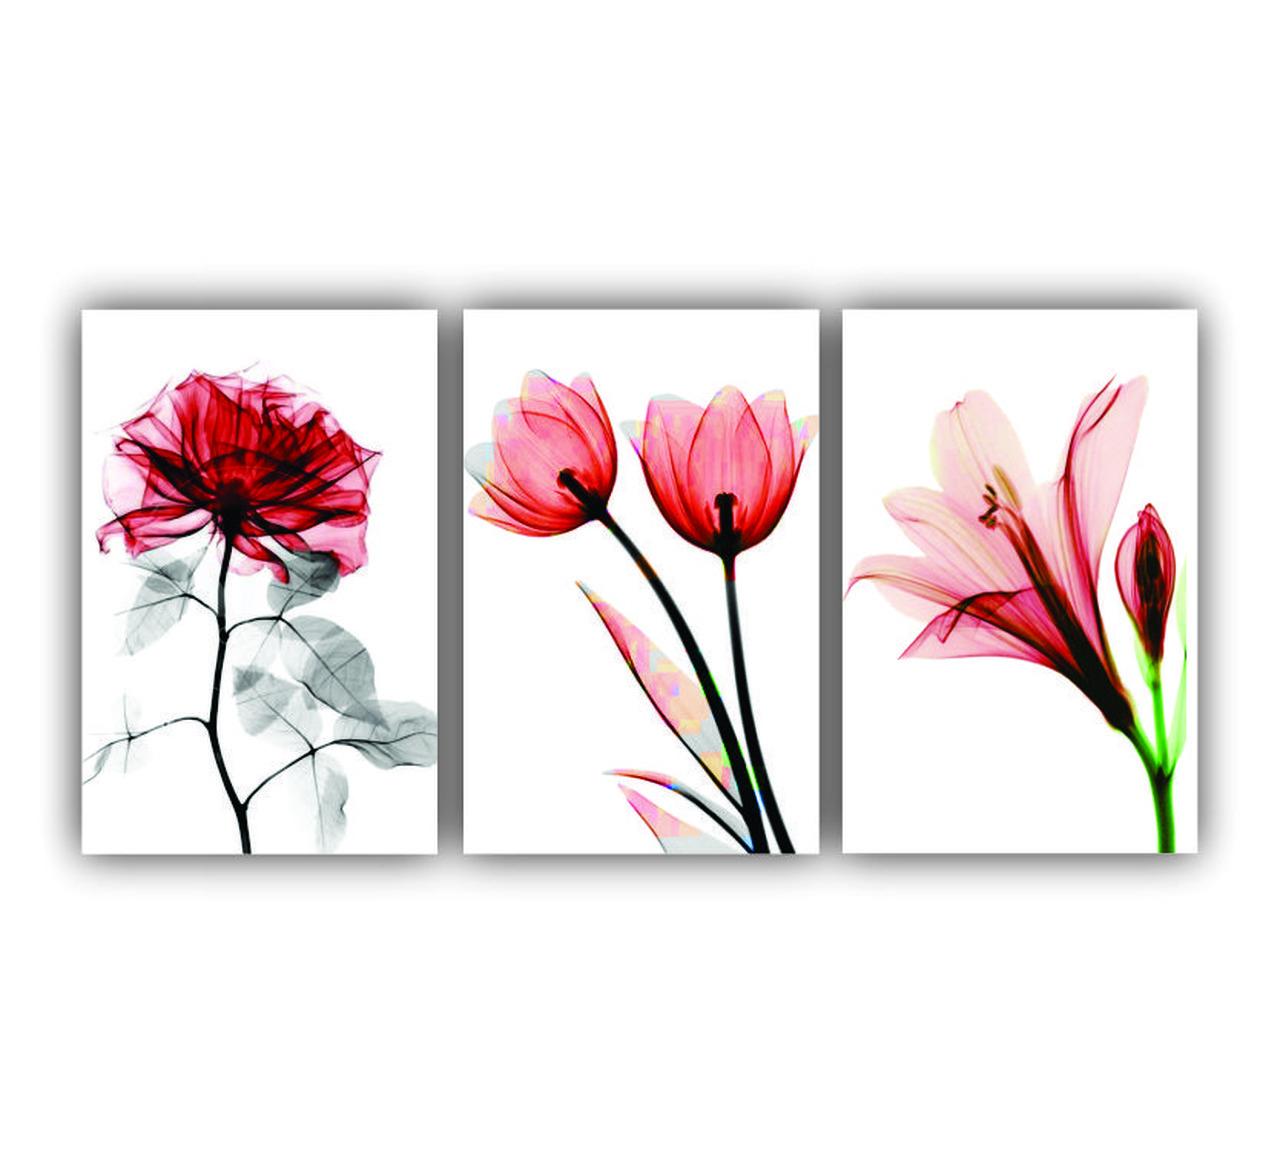 Quadro Decorativos Flores Finas Rosa Romance - Kit 3 telas